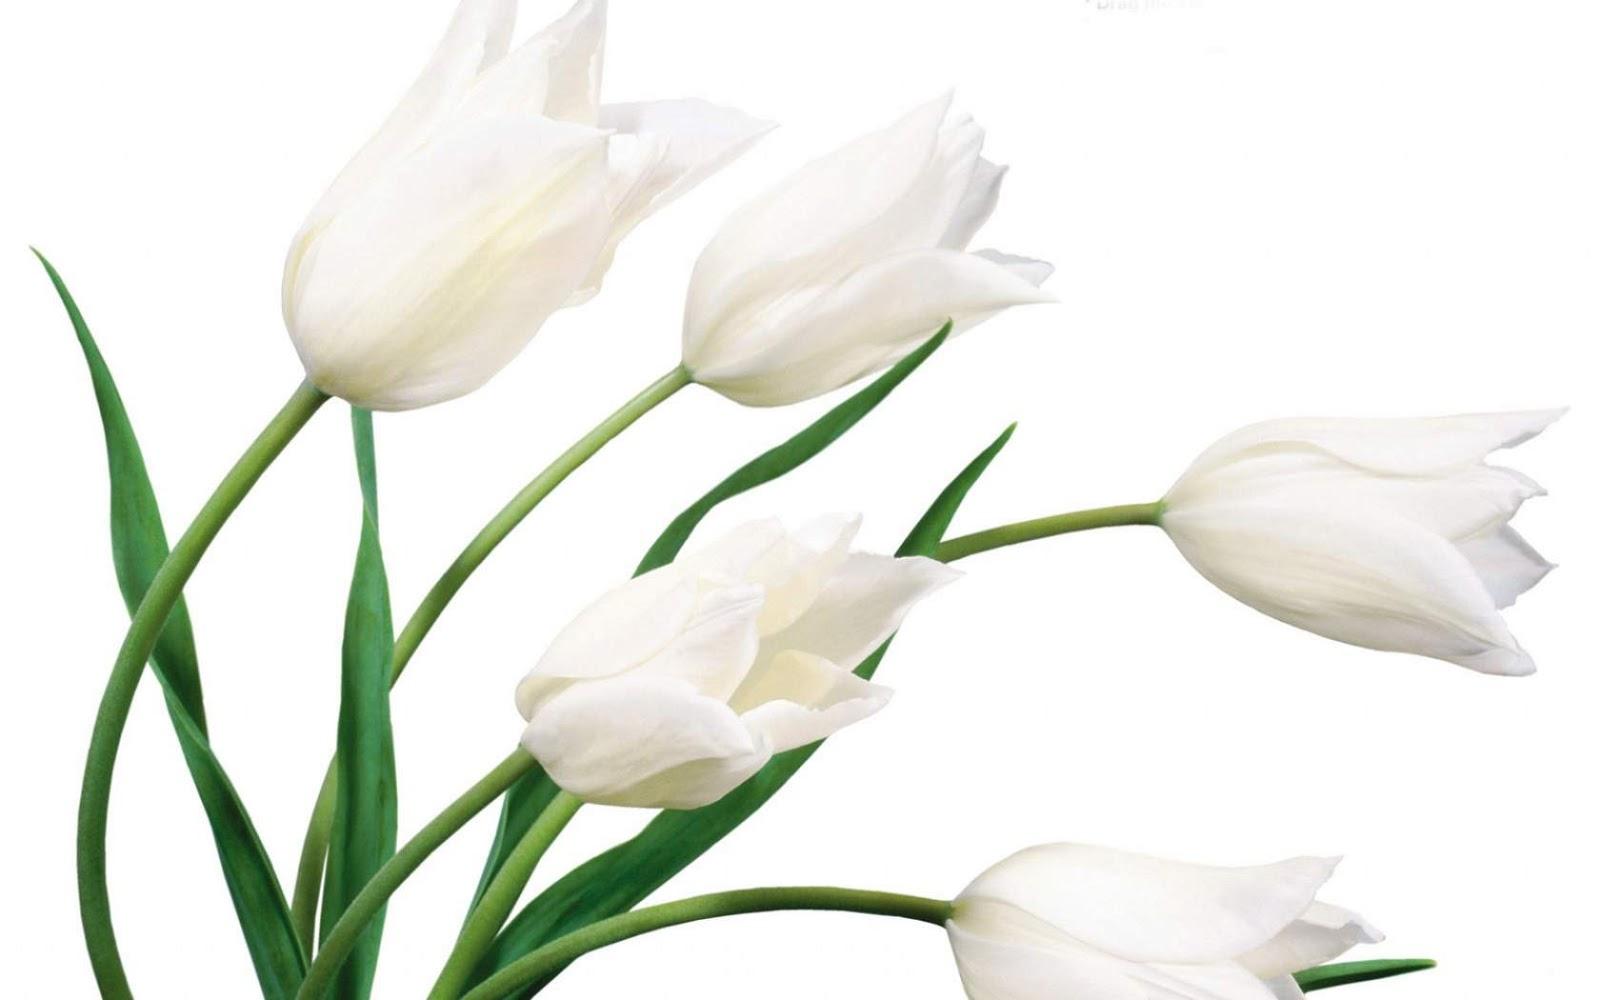 Flowers for flower lovers beautiful white flowers wallpapers beautiful white flowers wallpapers mightylinksfo